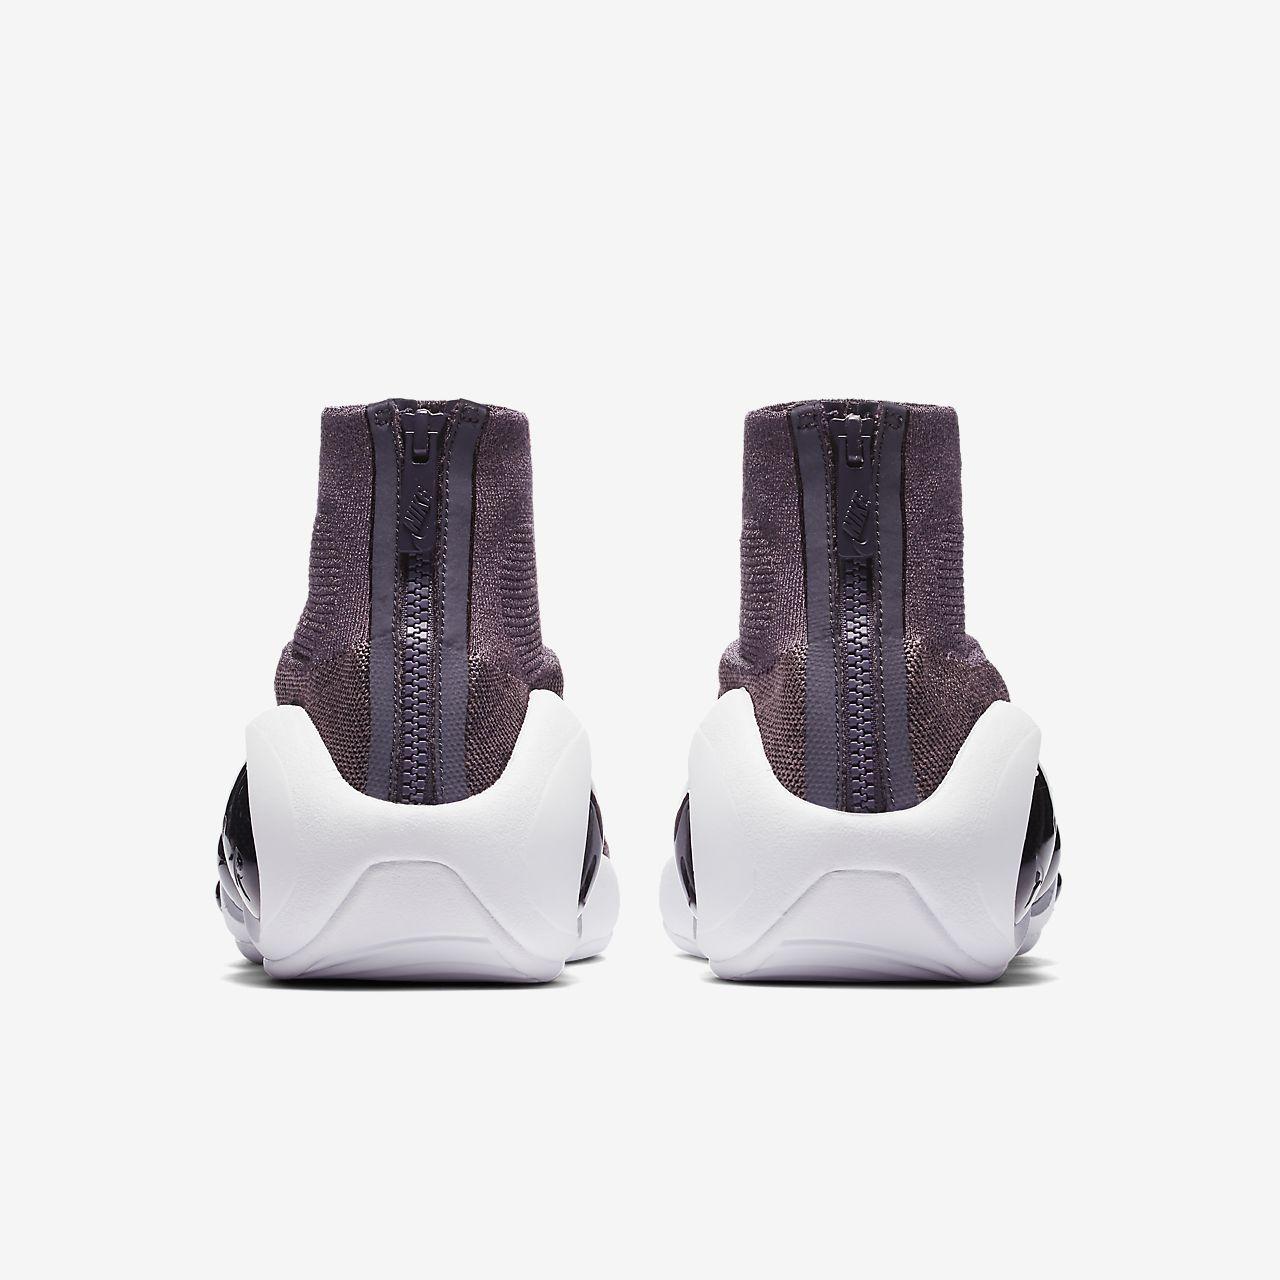 f4f2018c4bdd0 Nike Flight Bonafide Men s Shoe. Nike.com GB